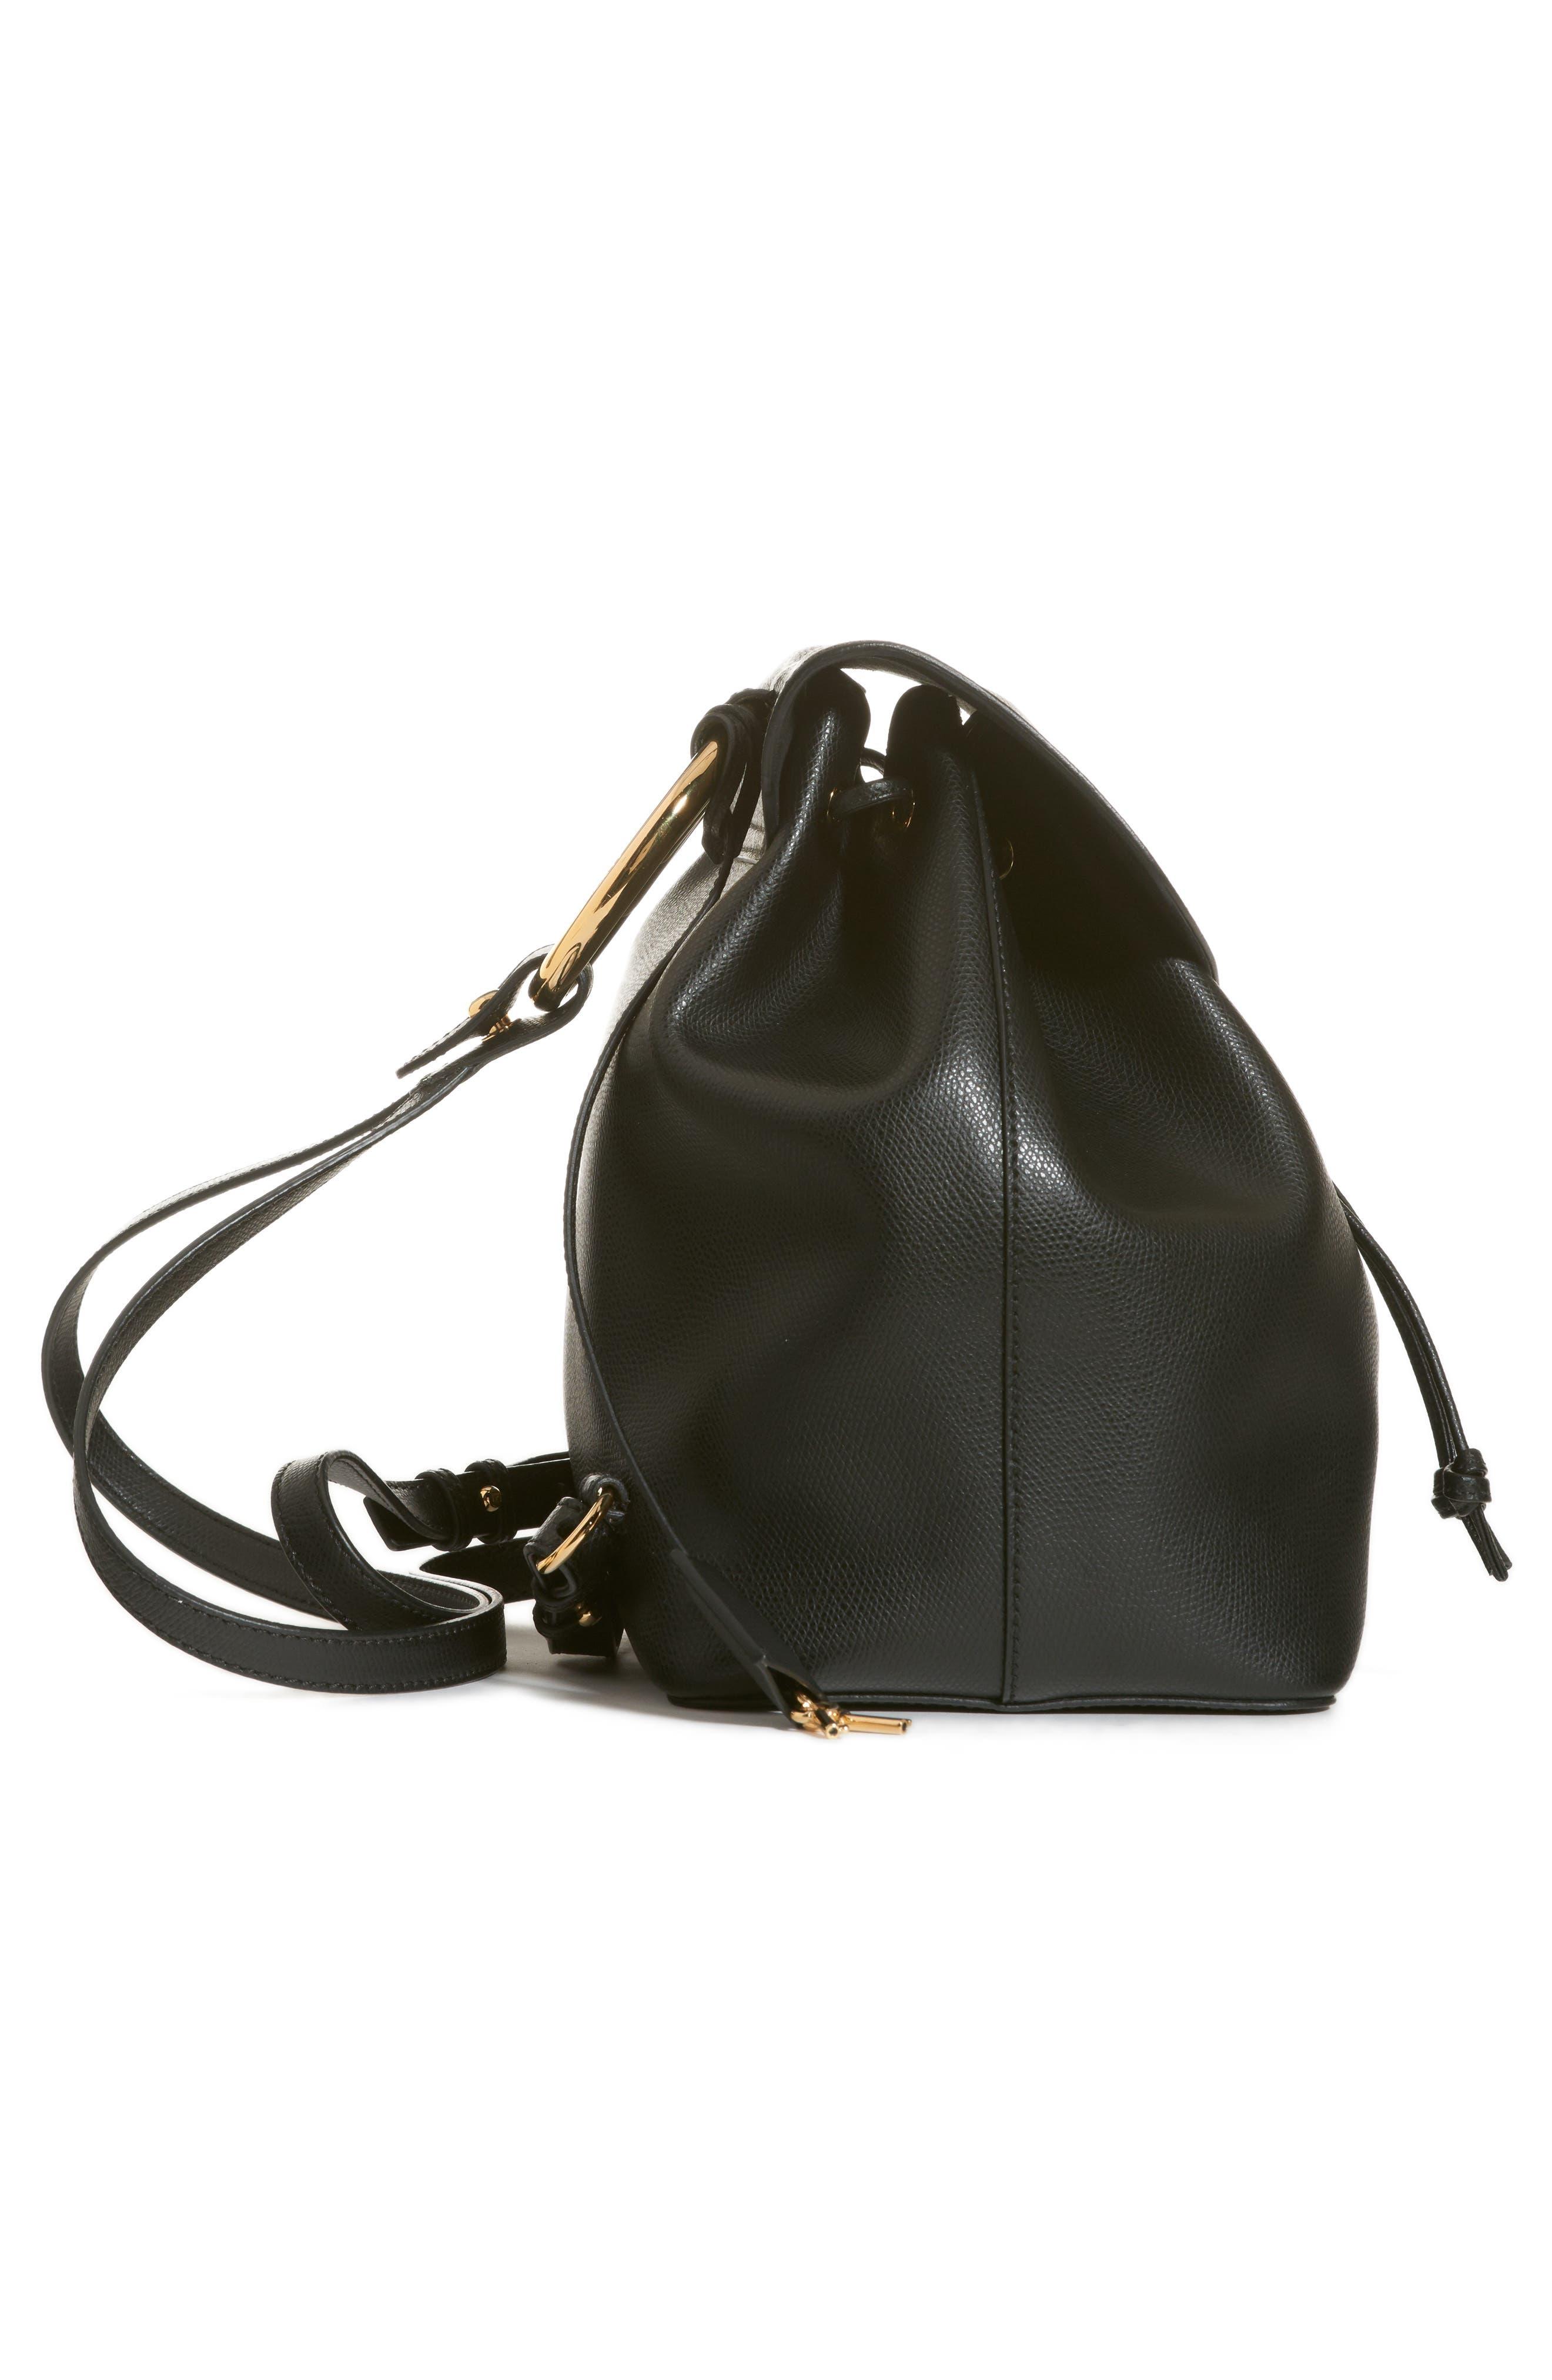 FENDI,                             Cruise Calfskin Leather Backpack,                             Alternate thumbnail 4, color,                             006